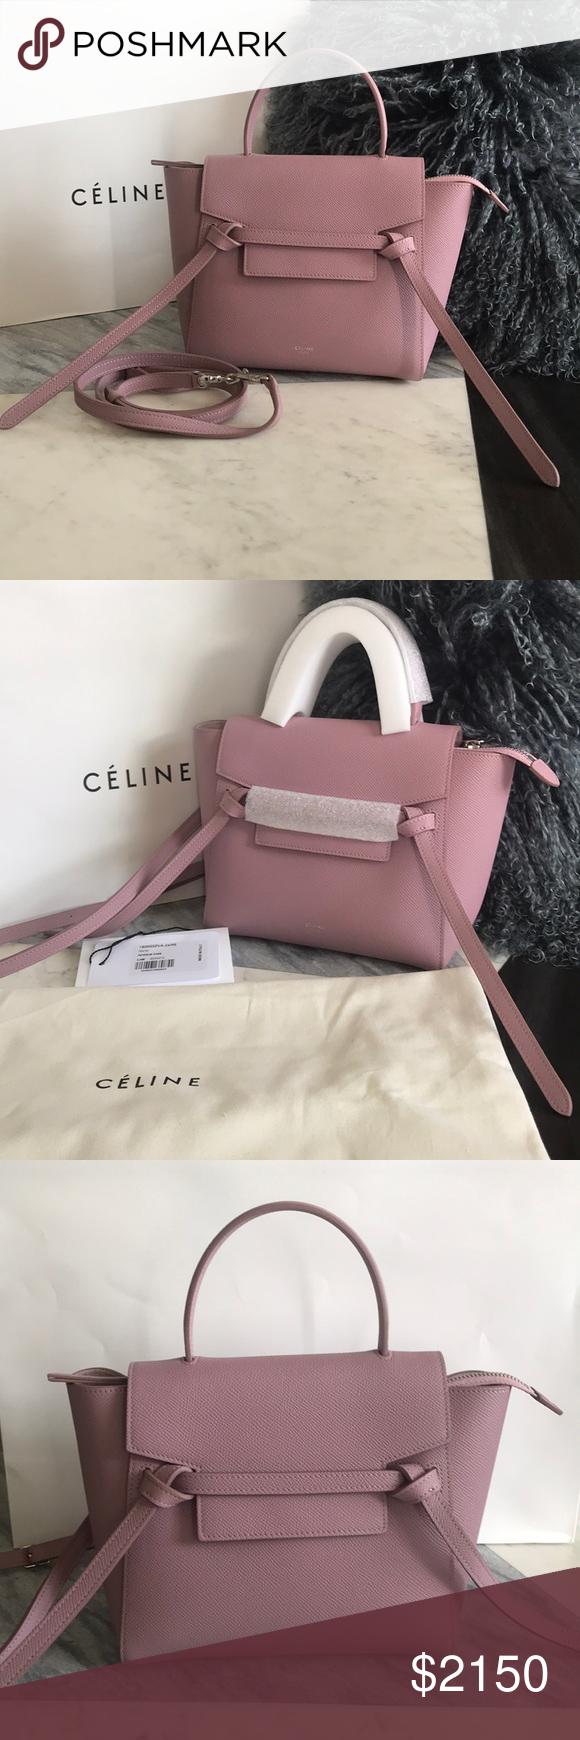 Authentic Celine Nano Belt Bag 2018 New love🤩 Antique Rose